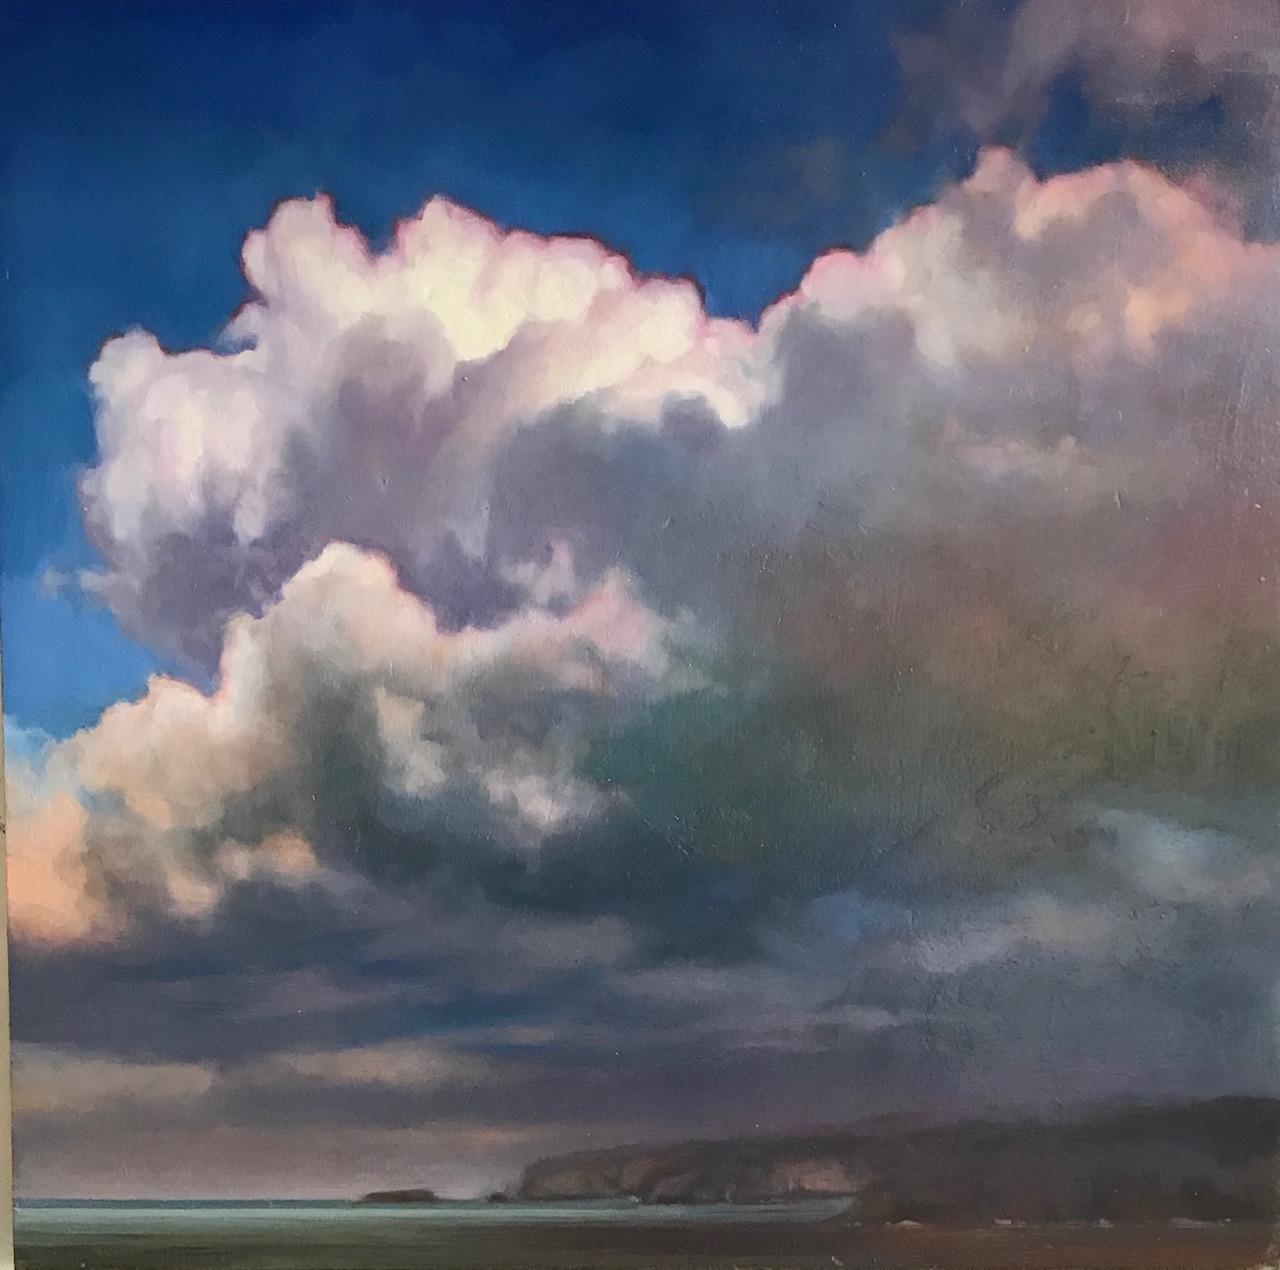 Purple Rain by Elzbieta Krawecka